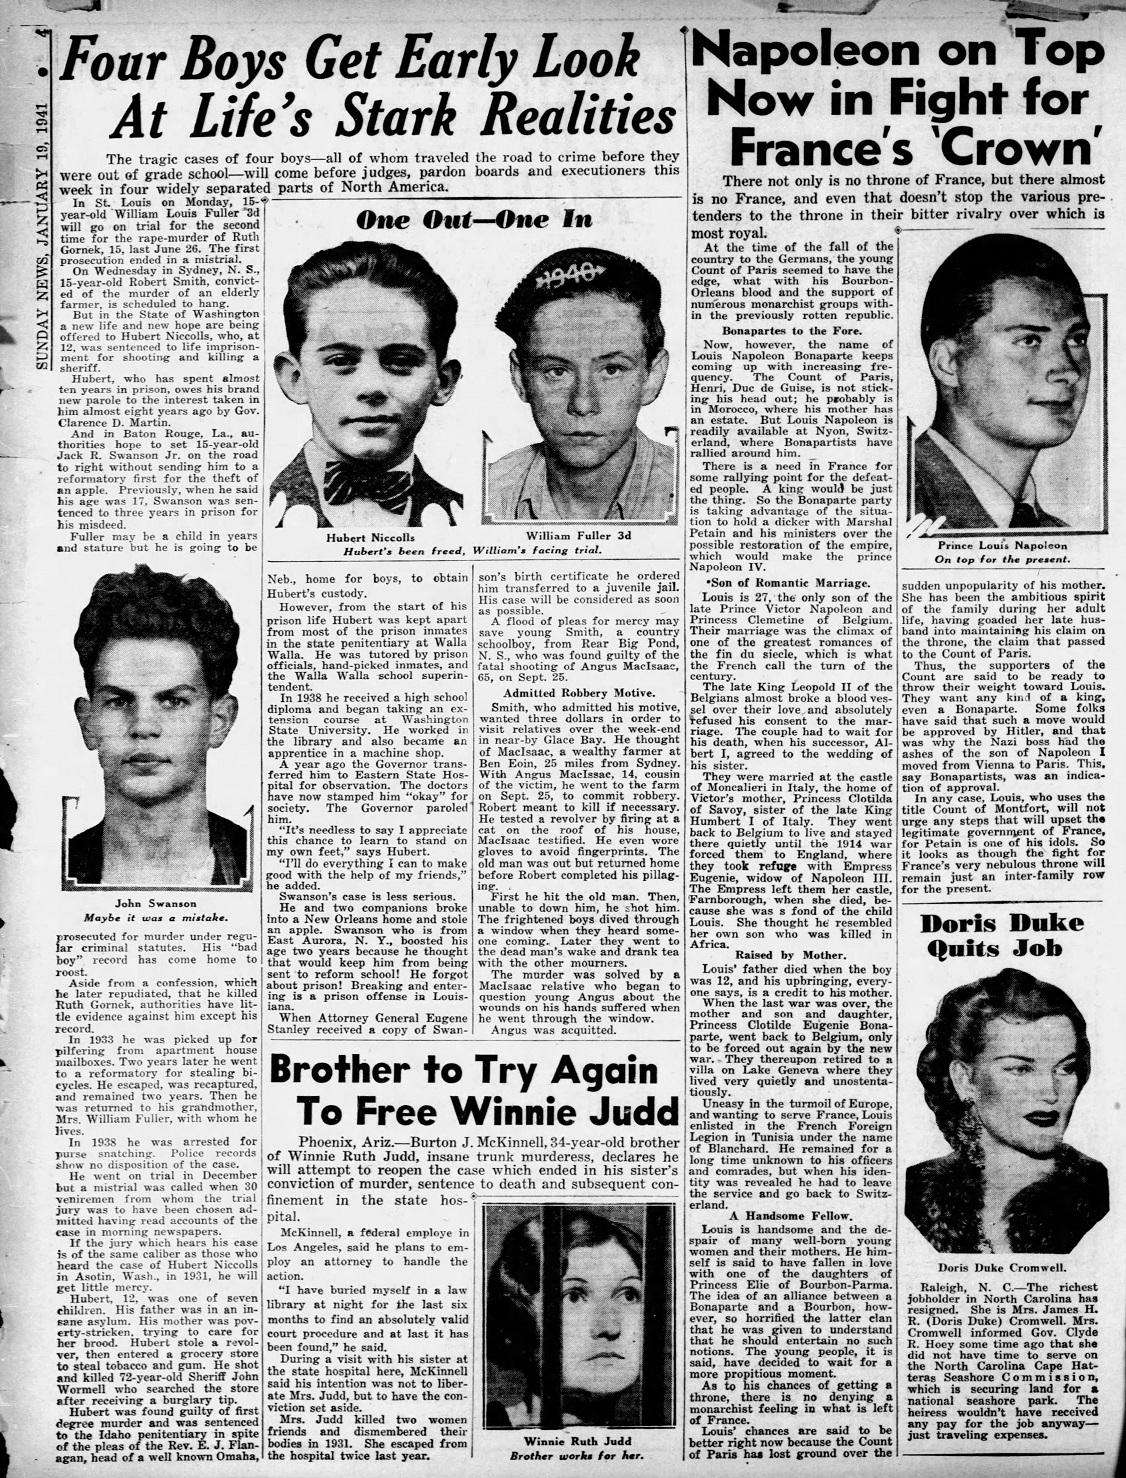 Daily_News_Sun__Jan_19__1941_.jpg